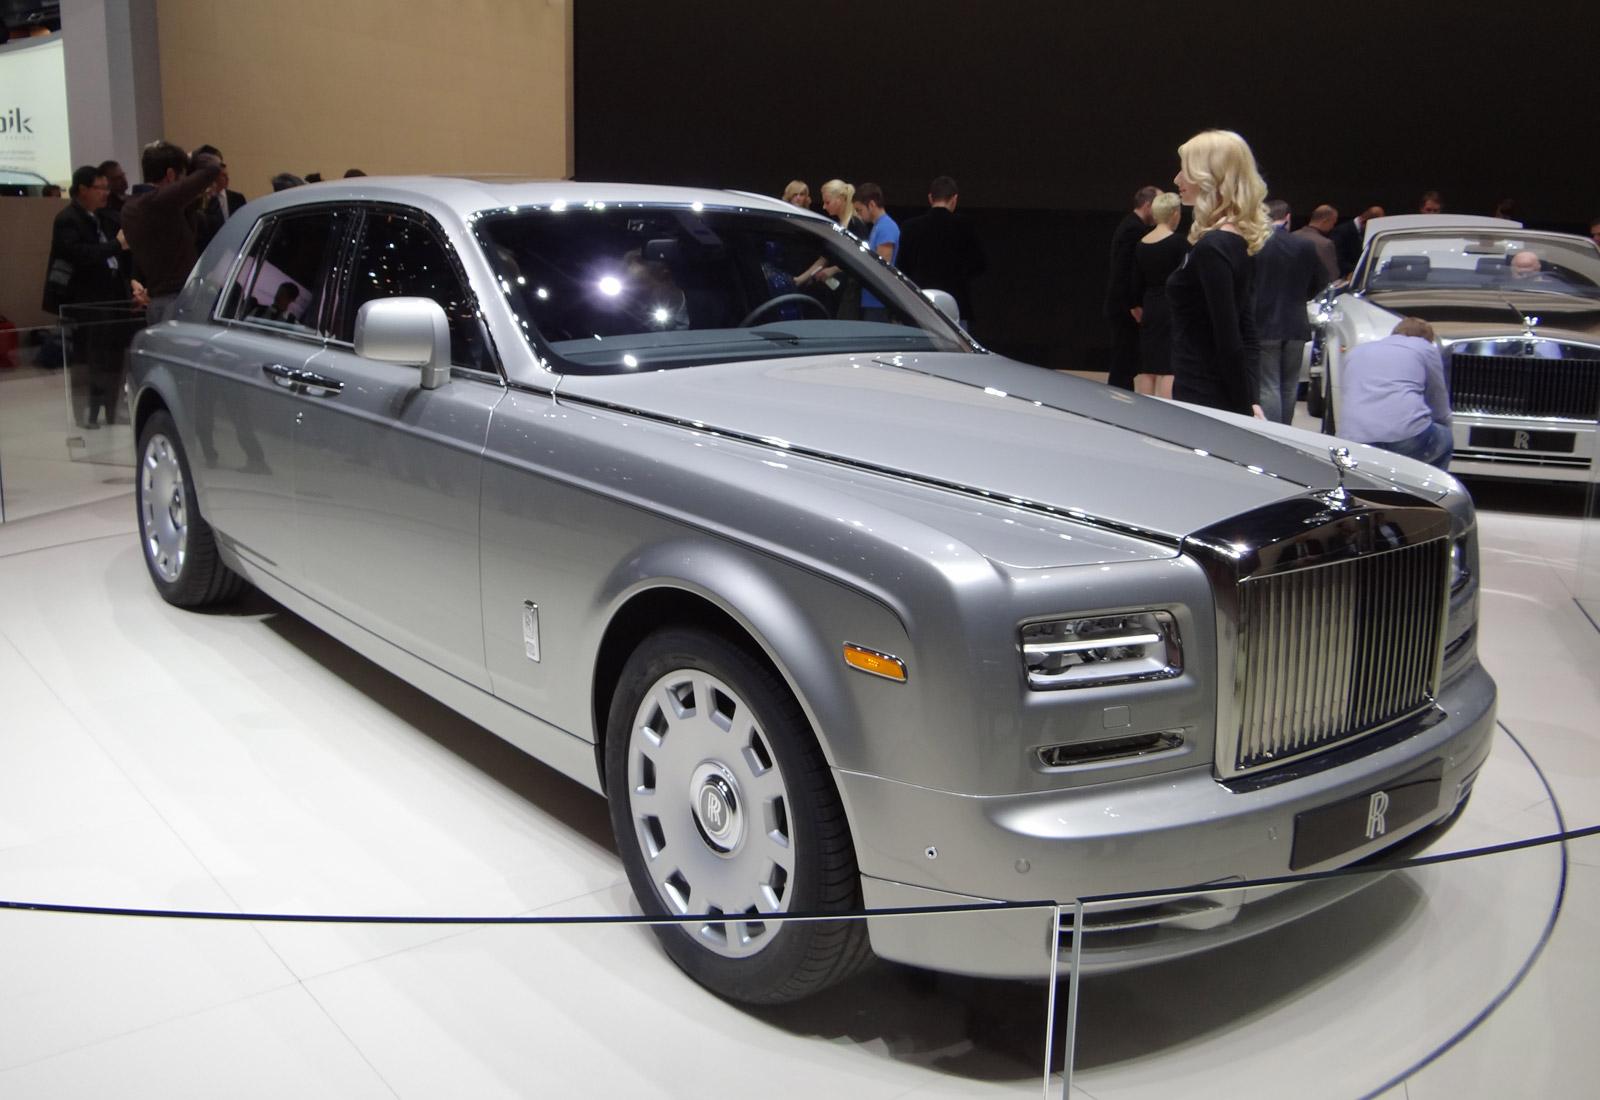 Rolls royce phantom series ii released photos from geneva for Rolls royce phantom motor